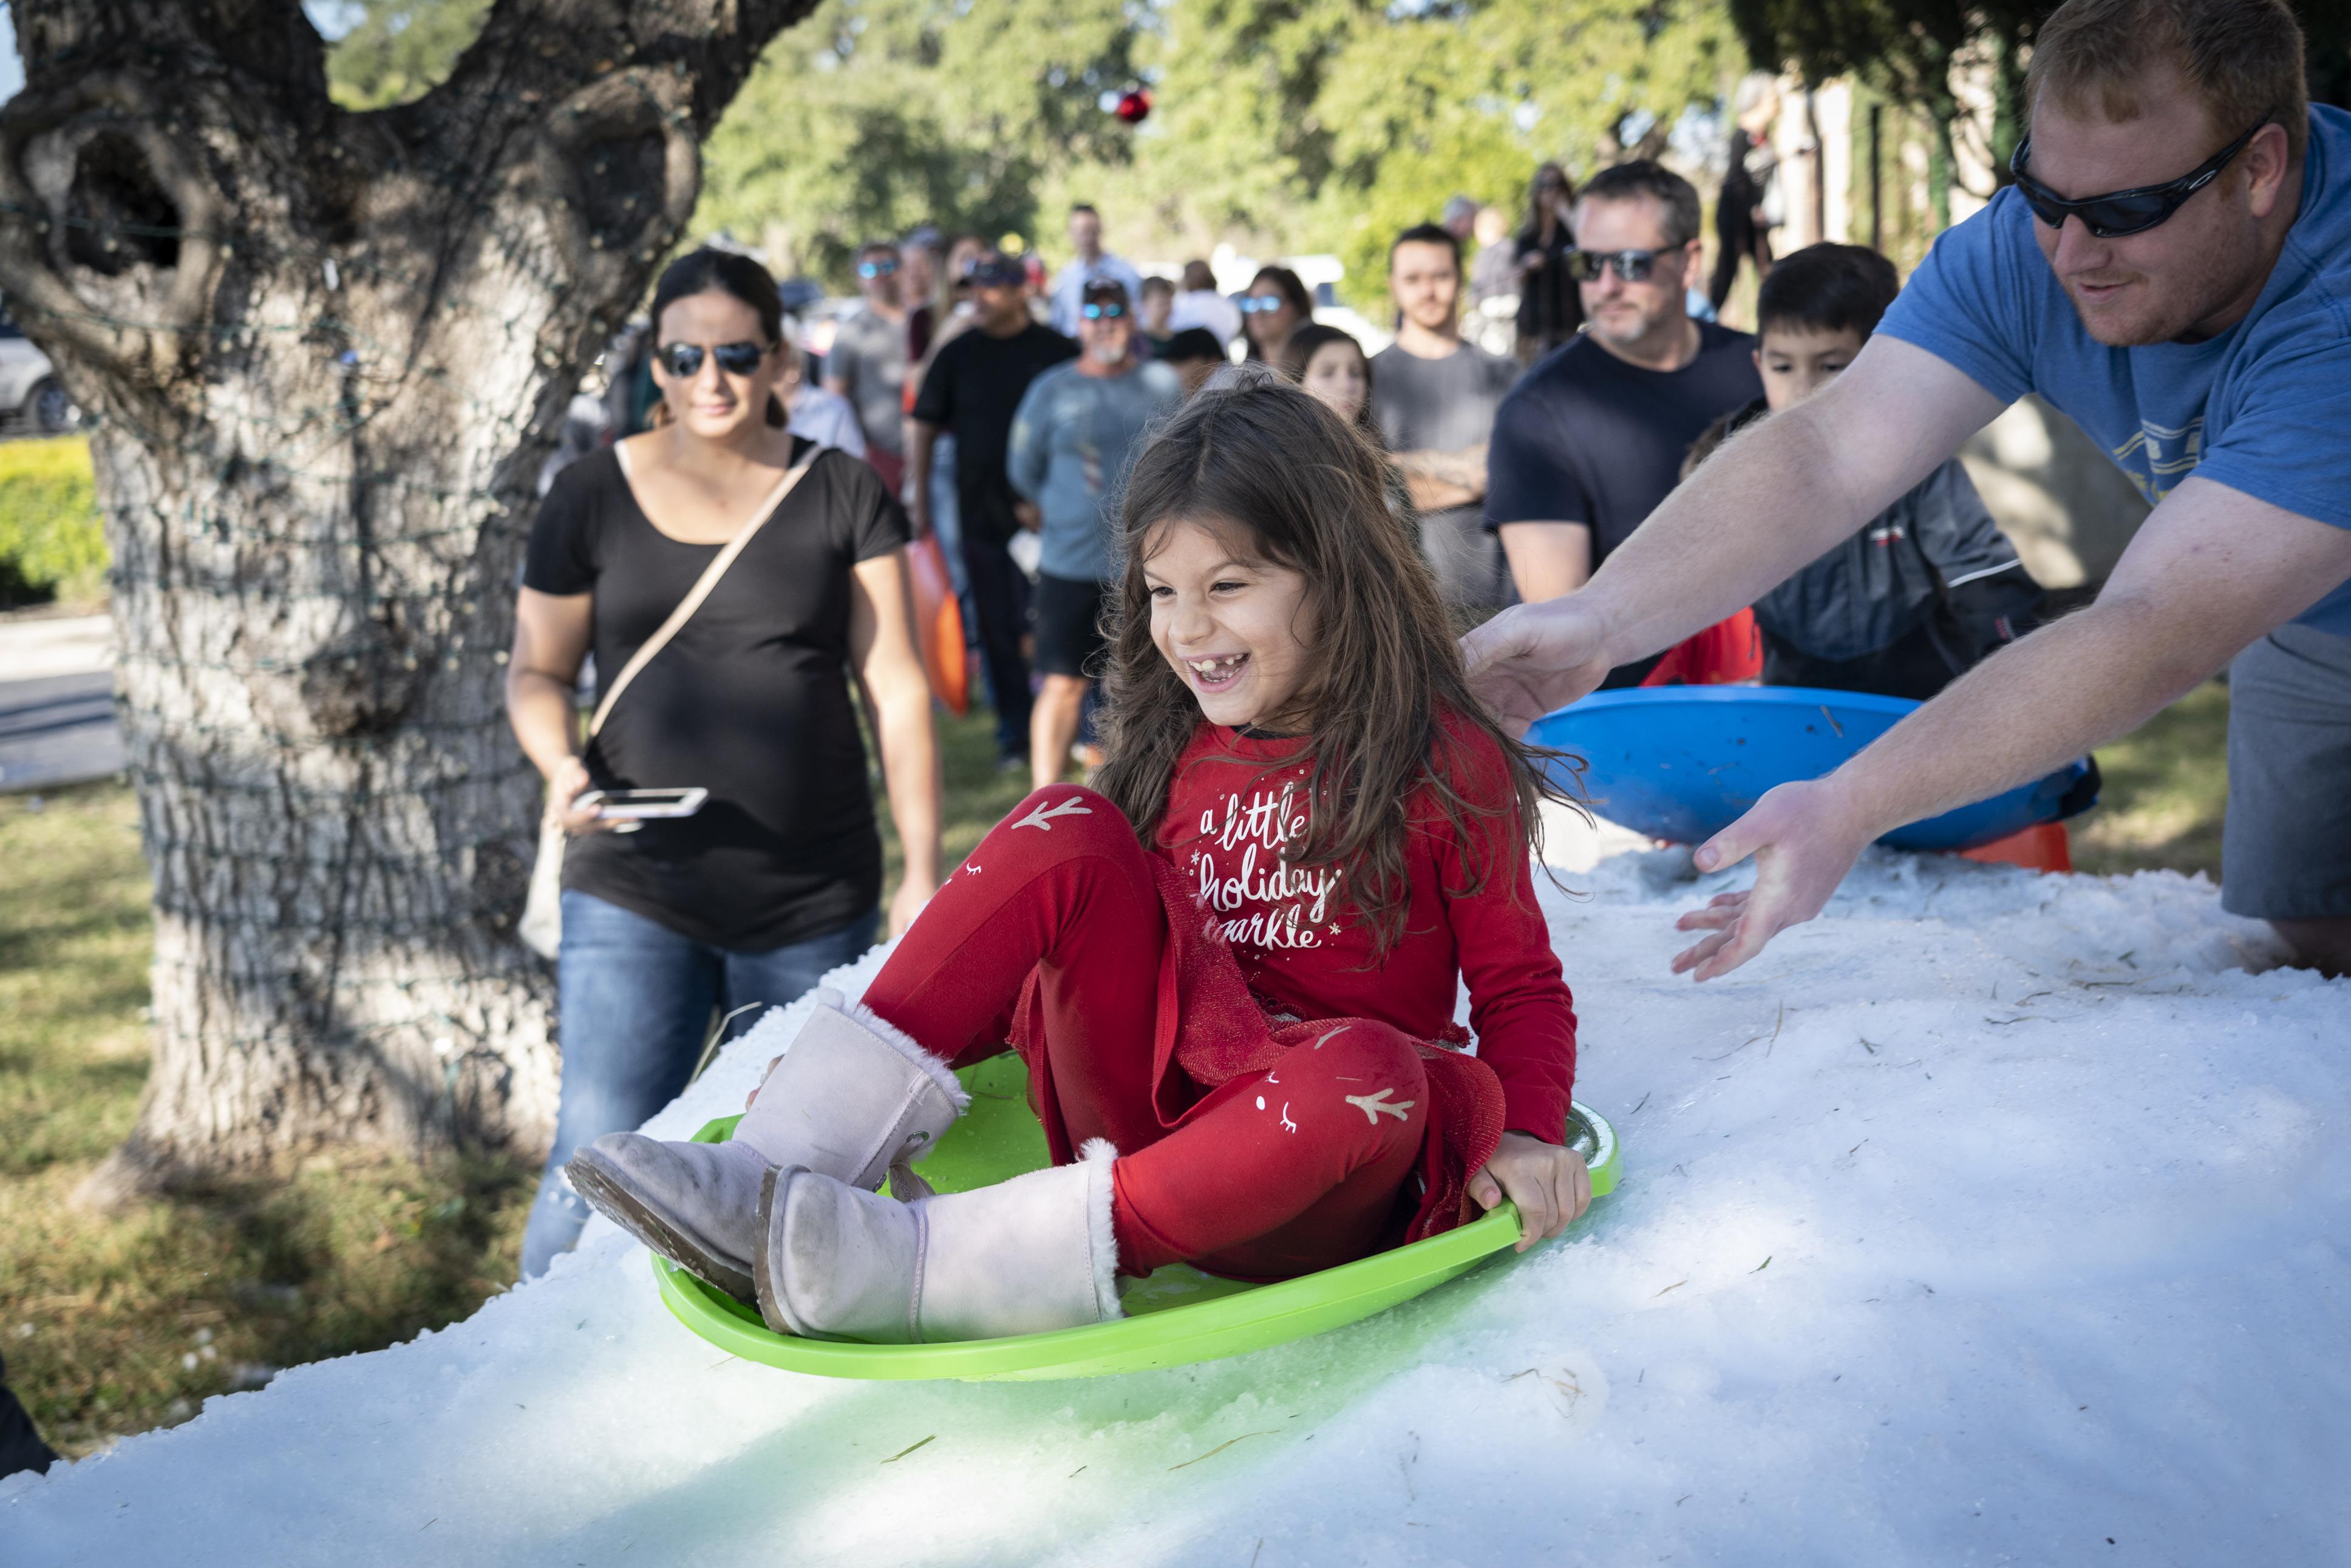 2019 Holiday Sledding Party at Vintage Oaks New Braunfels Texas (84)